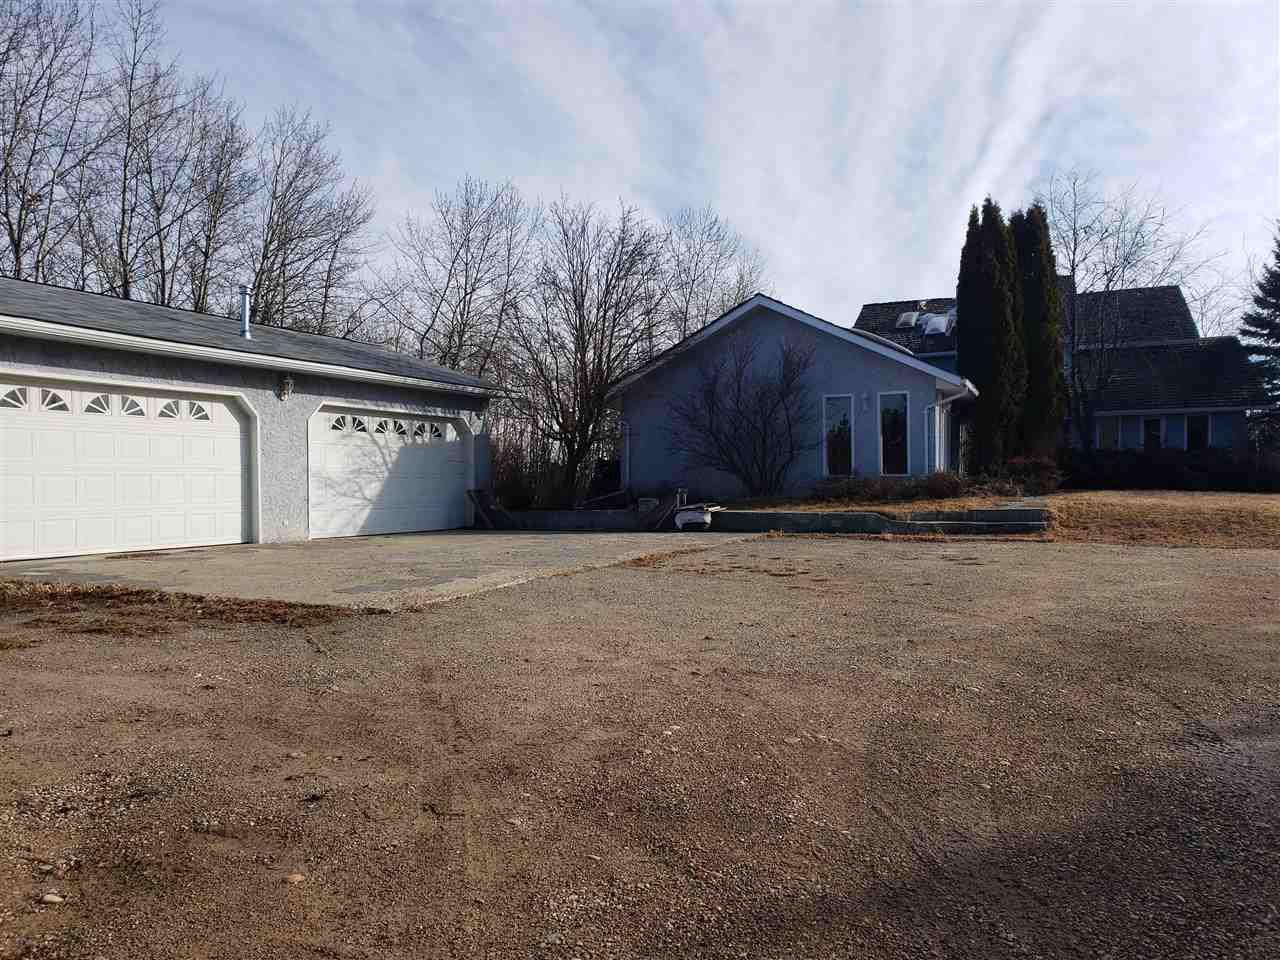 Main Photo: 35 52420 RANGE ROAD 13: Rural Parkland County House for sale : MLS®# E4151156